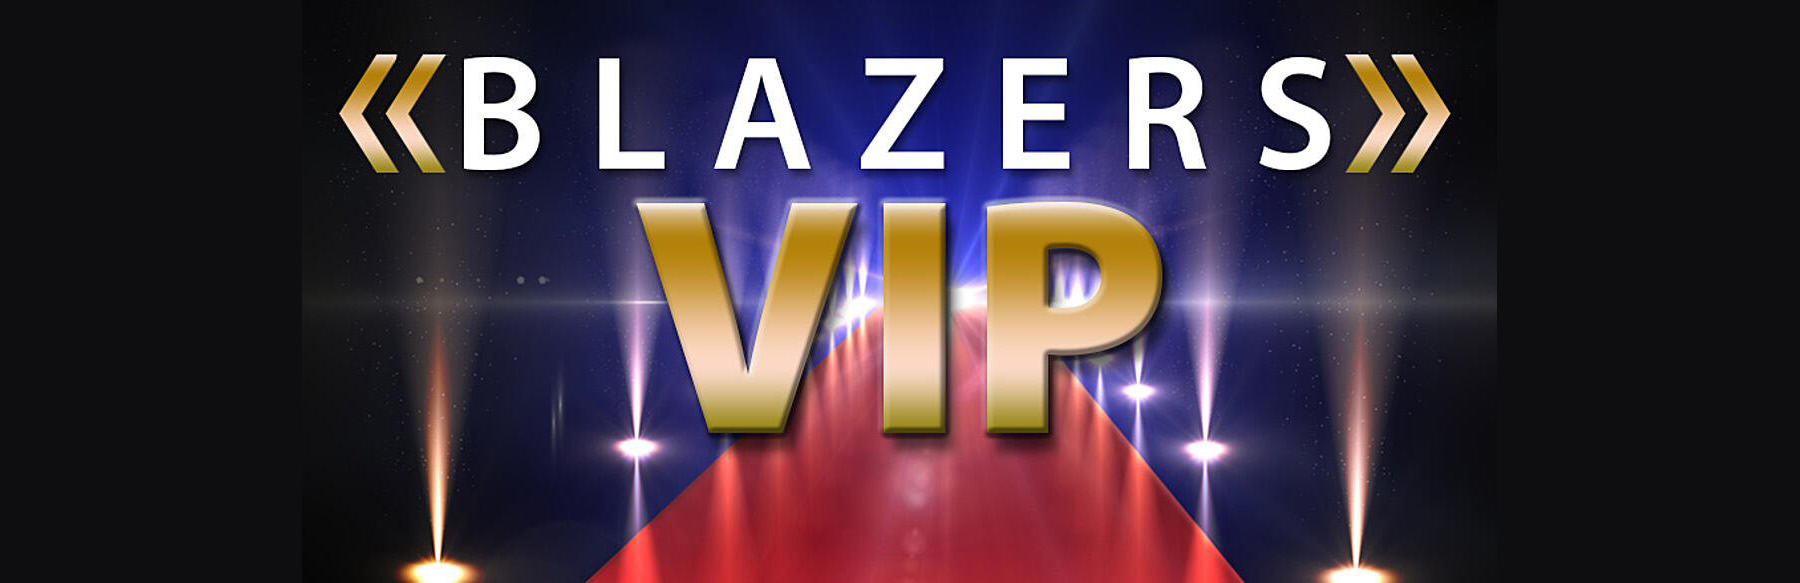 Blazers VIP